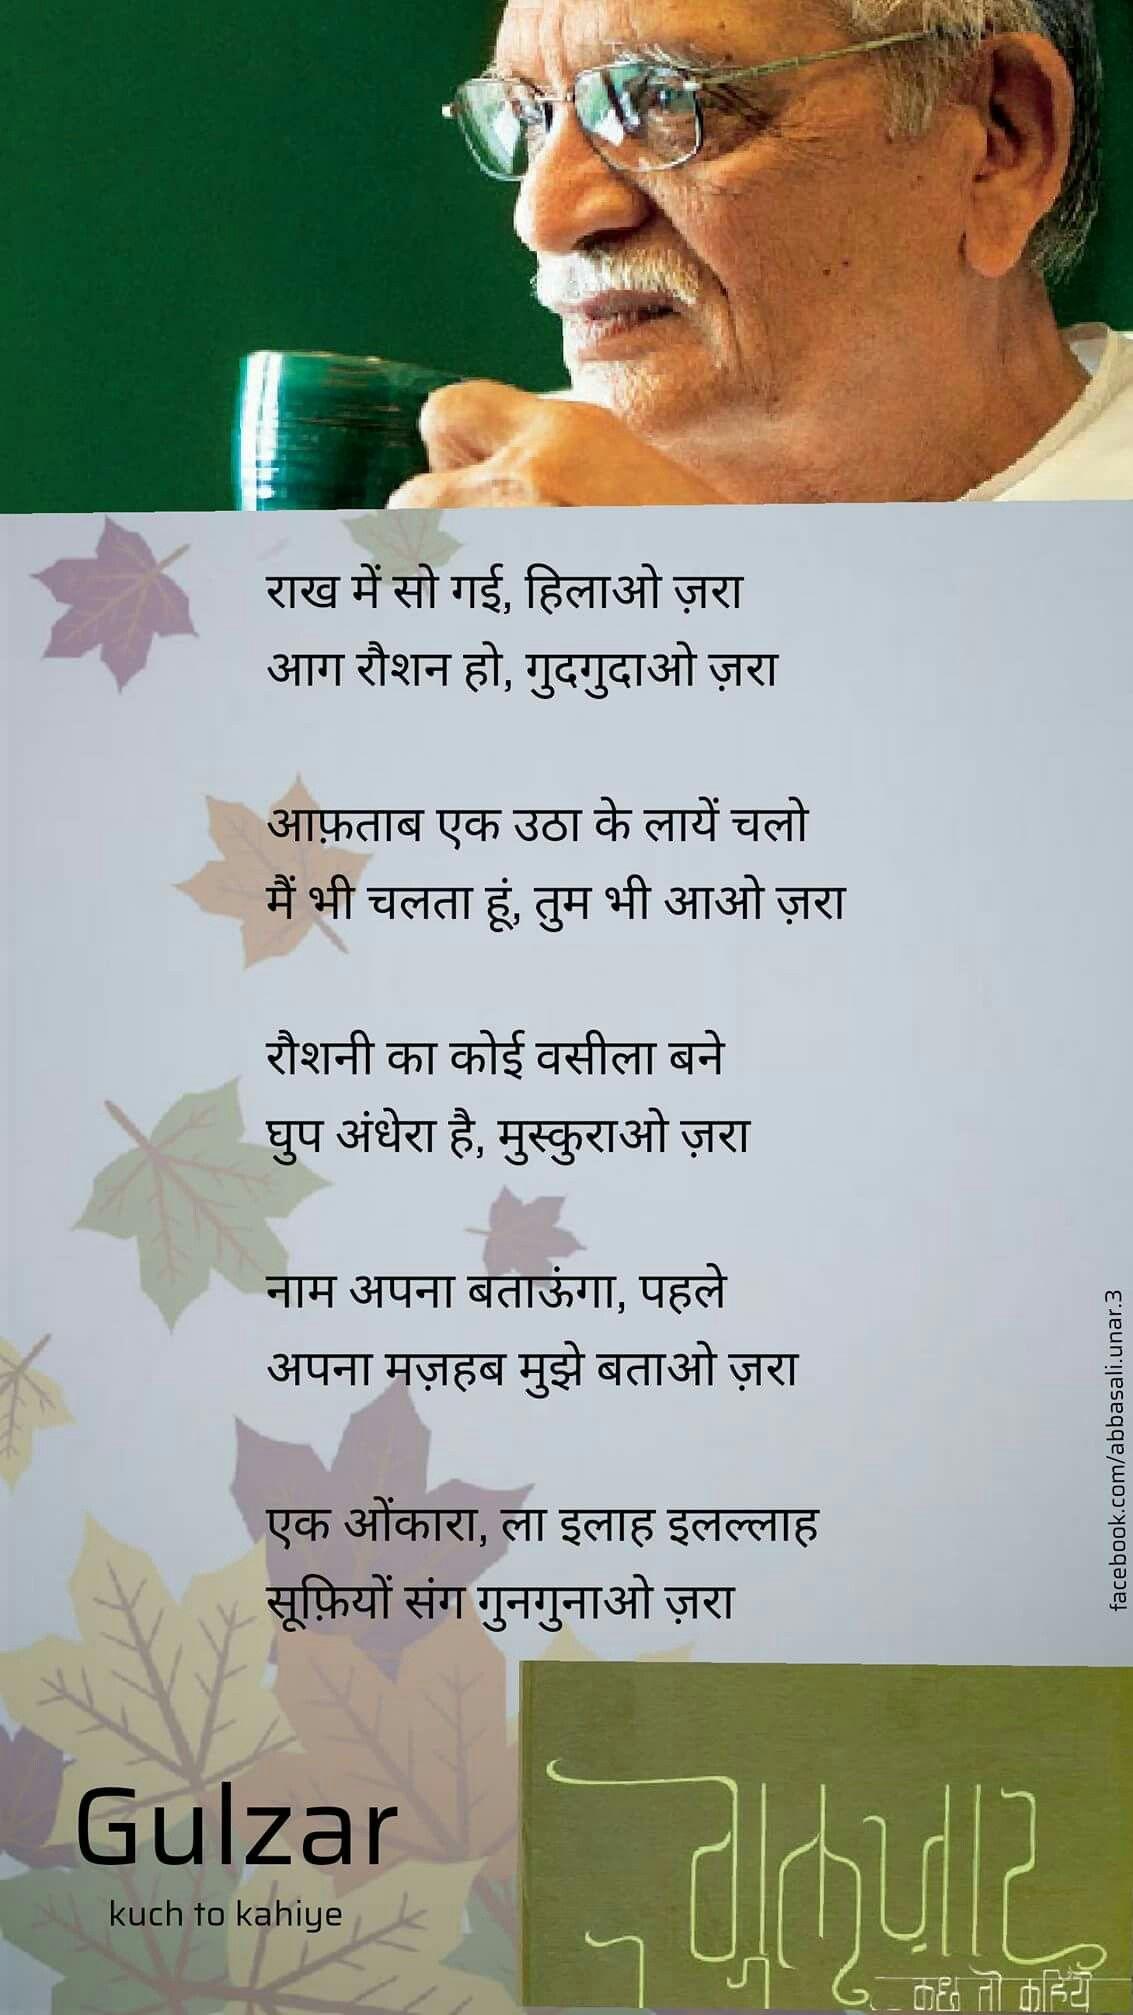 Image by Sangeeta on गुलज़ार साहेब.. Shyari quotes